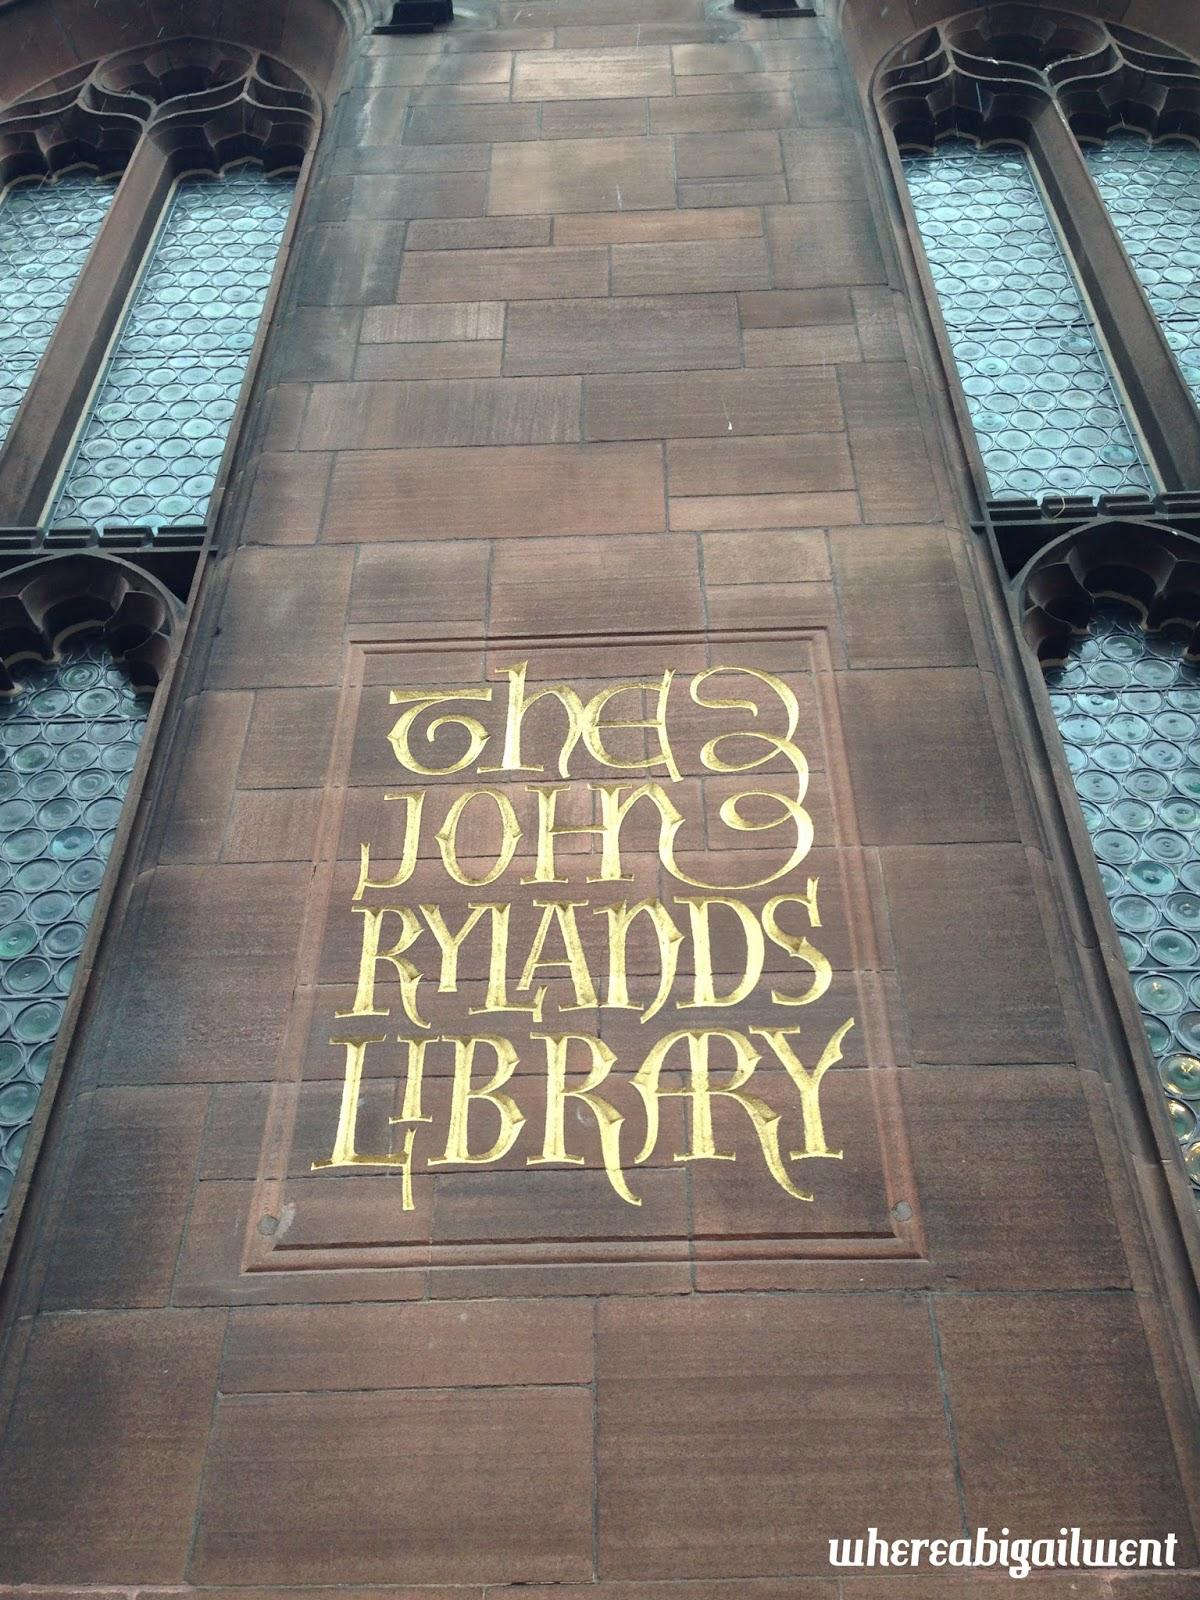 John Rylands Library Exterior